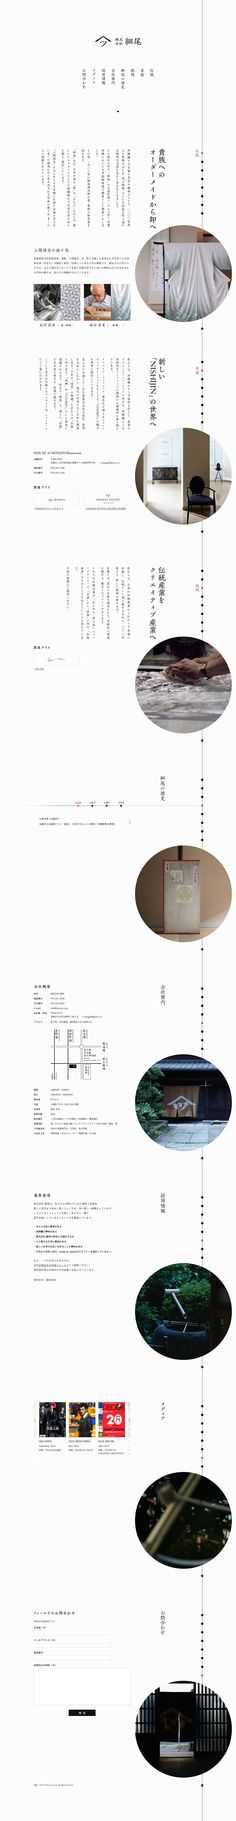 細尾 http://www.hosoo.co.jp/  (Als je deze zou opvouwen, kan je hem als folder lezen door hem te draaien van richting, en kan je hem als poster gebruiken als je hem helemaal ontvouwt)